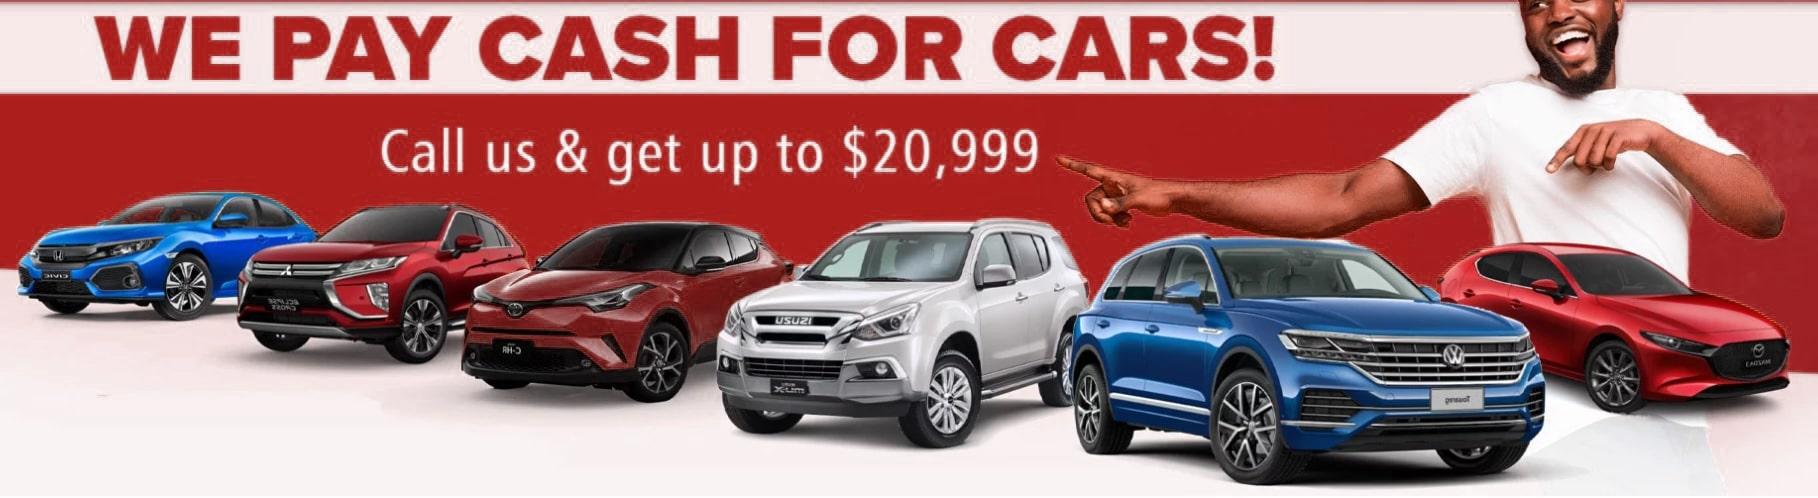 Cash for Cars McCrae